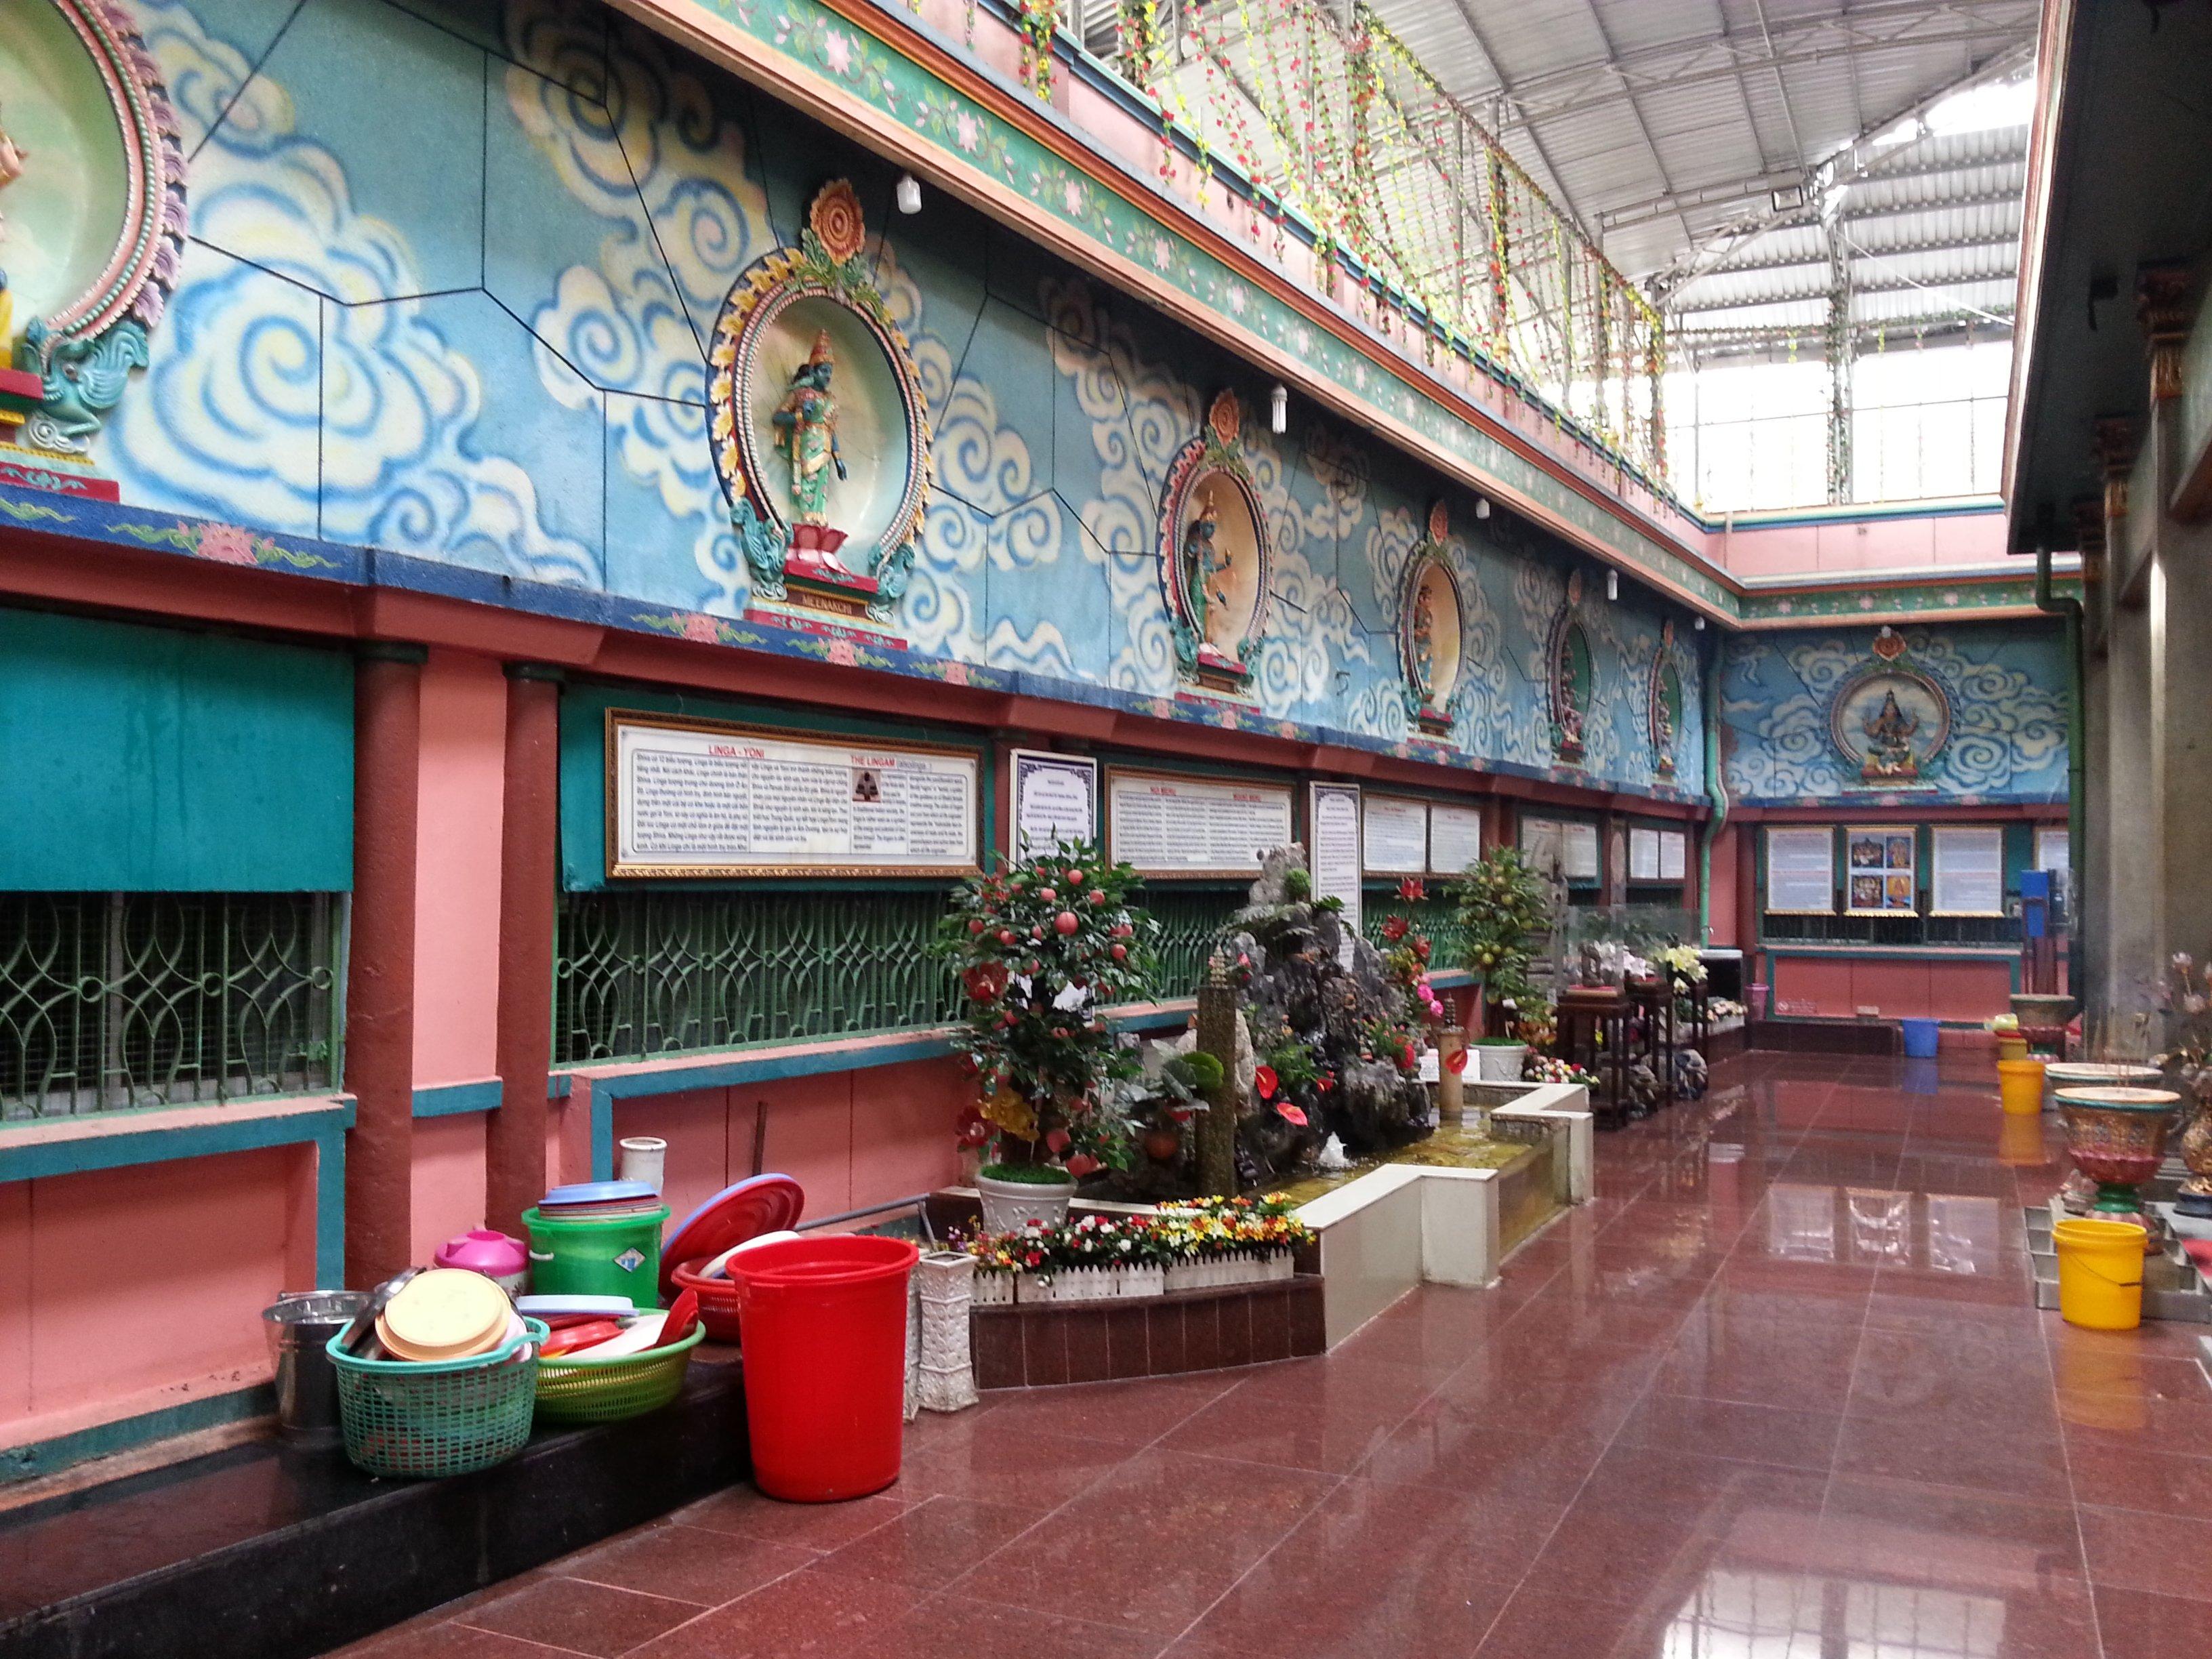 Inside the Mariamman Temple